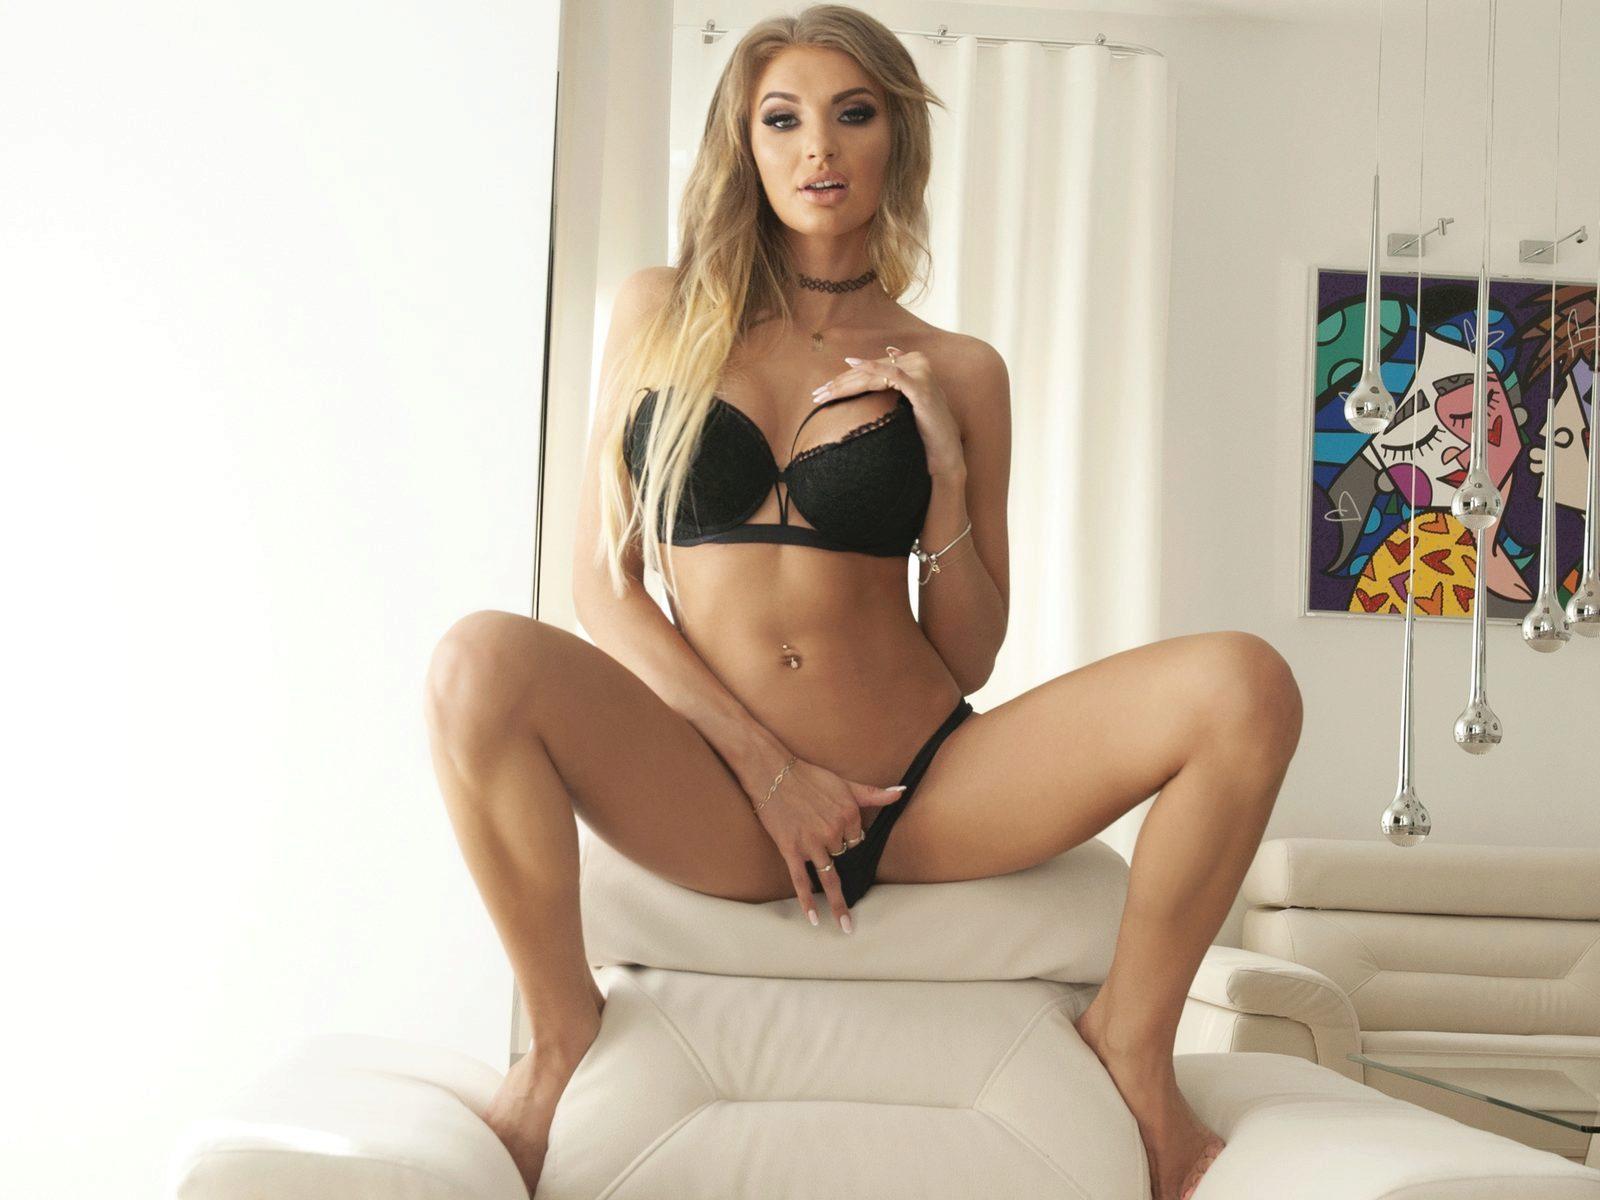 Webcam model Sally Marie from WebPowerCam